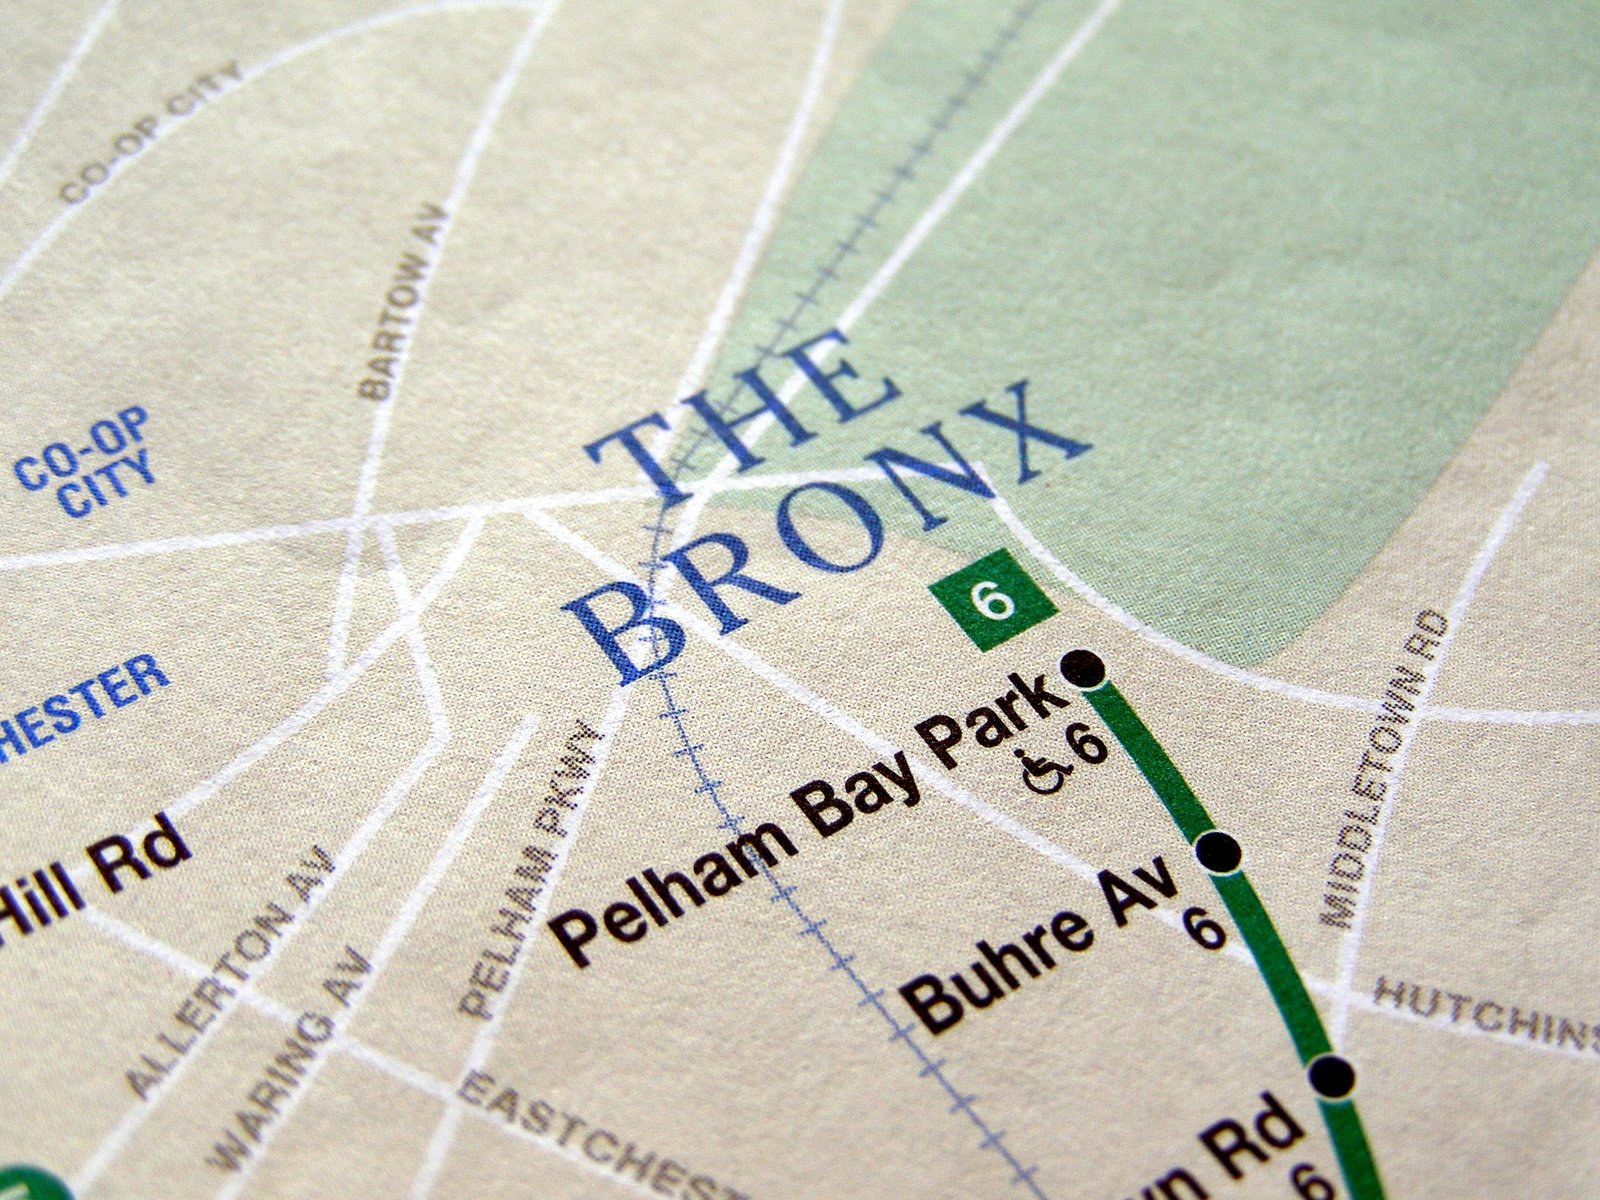 Pelham Parkway Bronx, NY Private Investigator